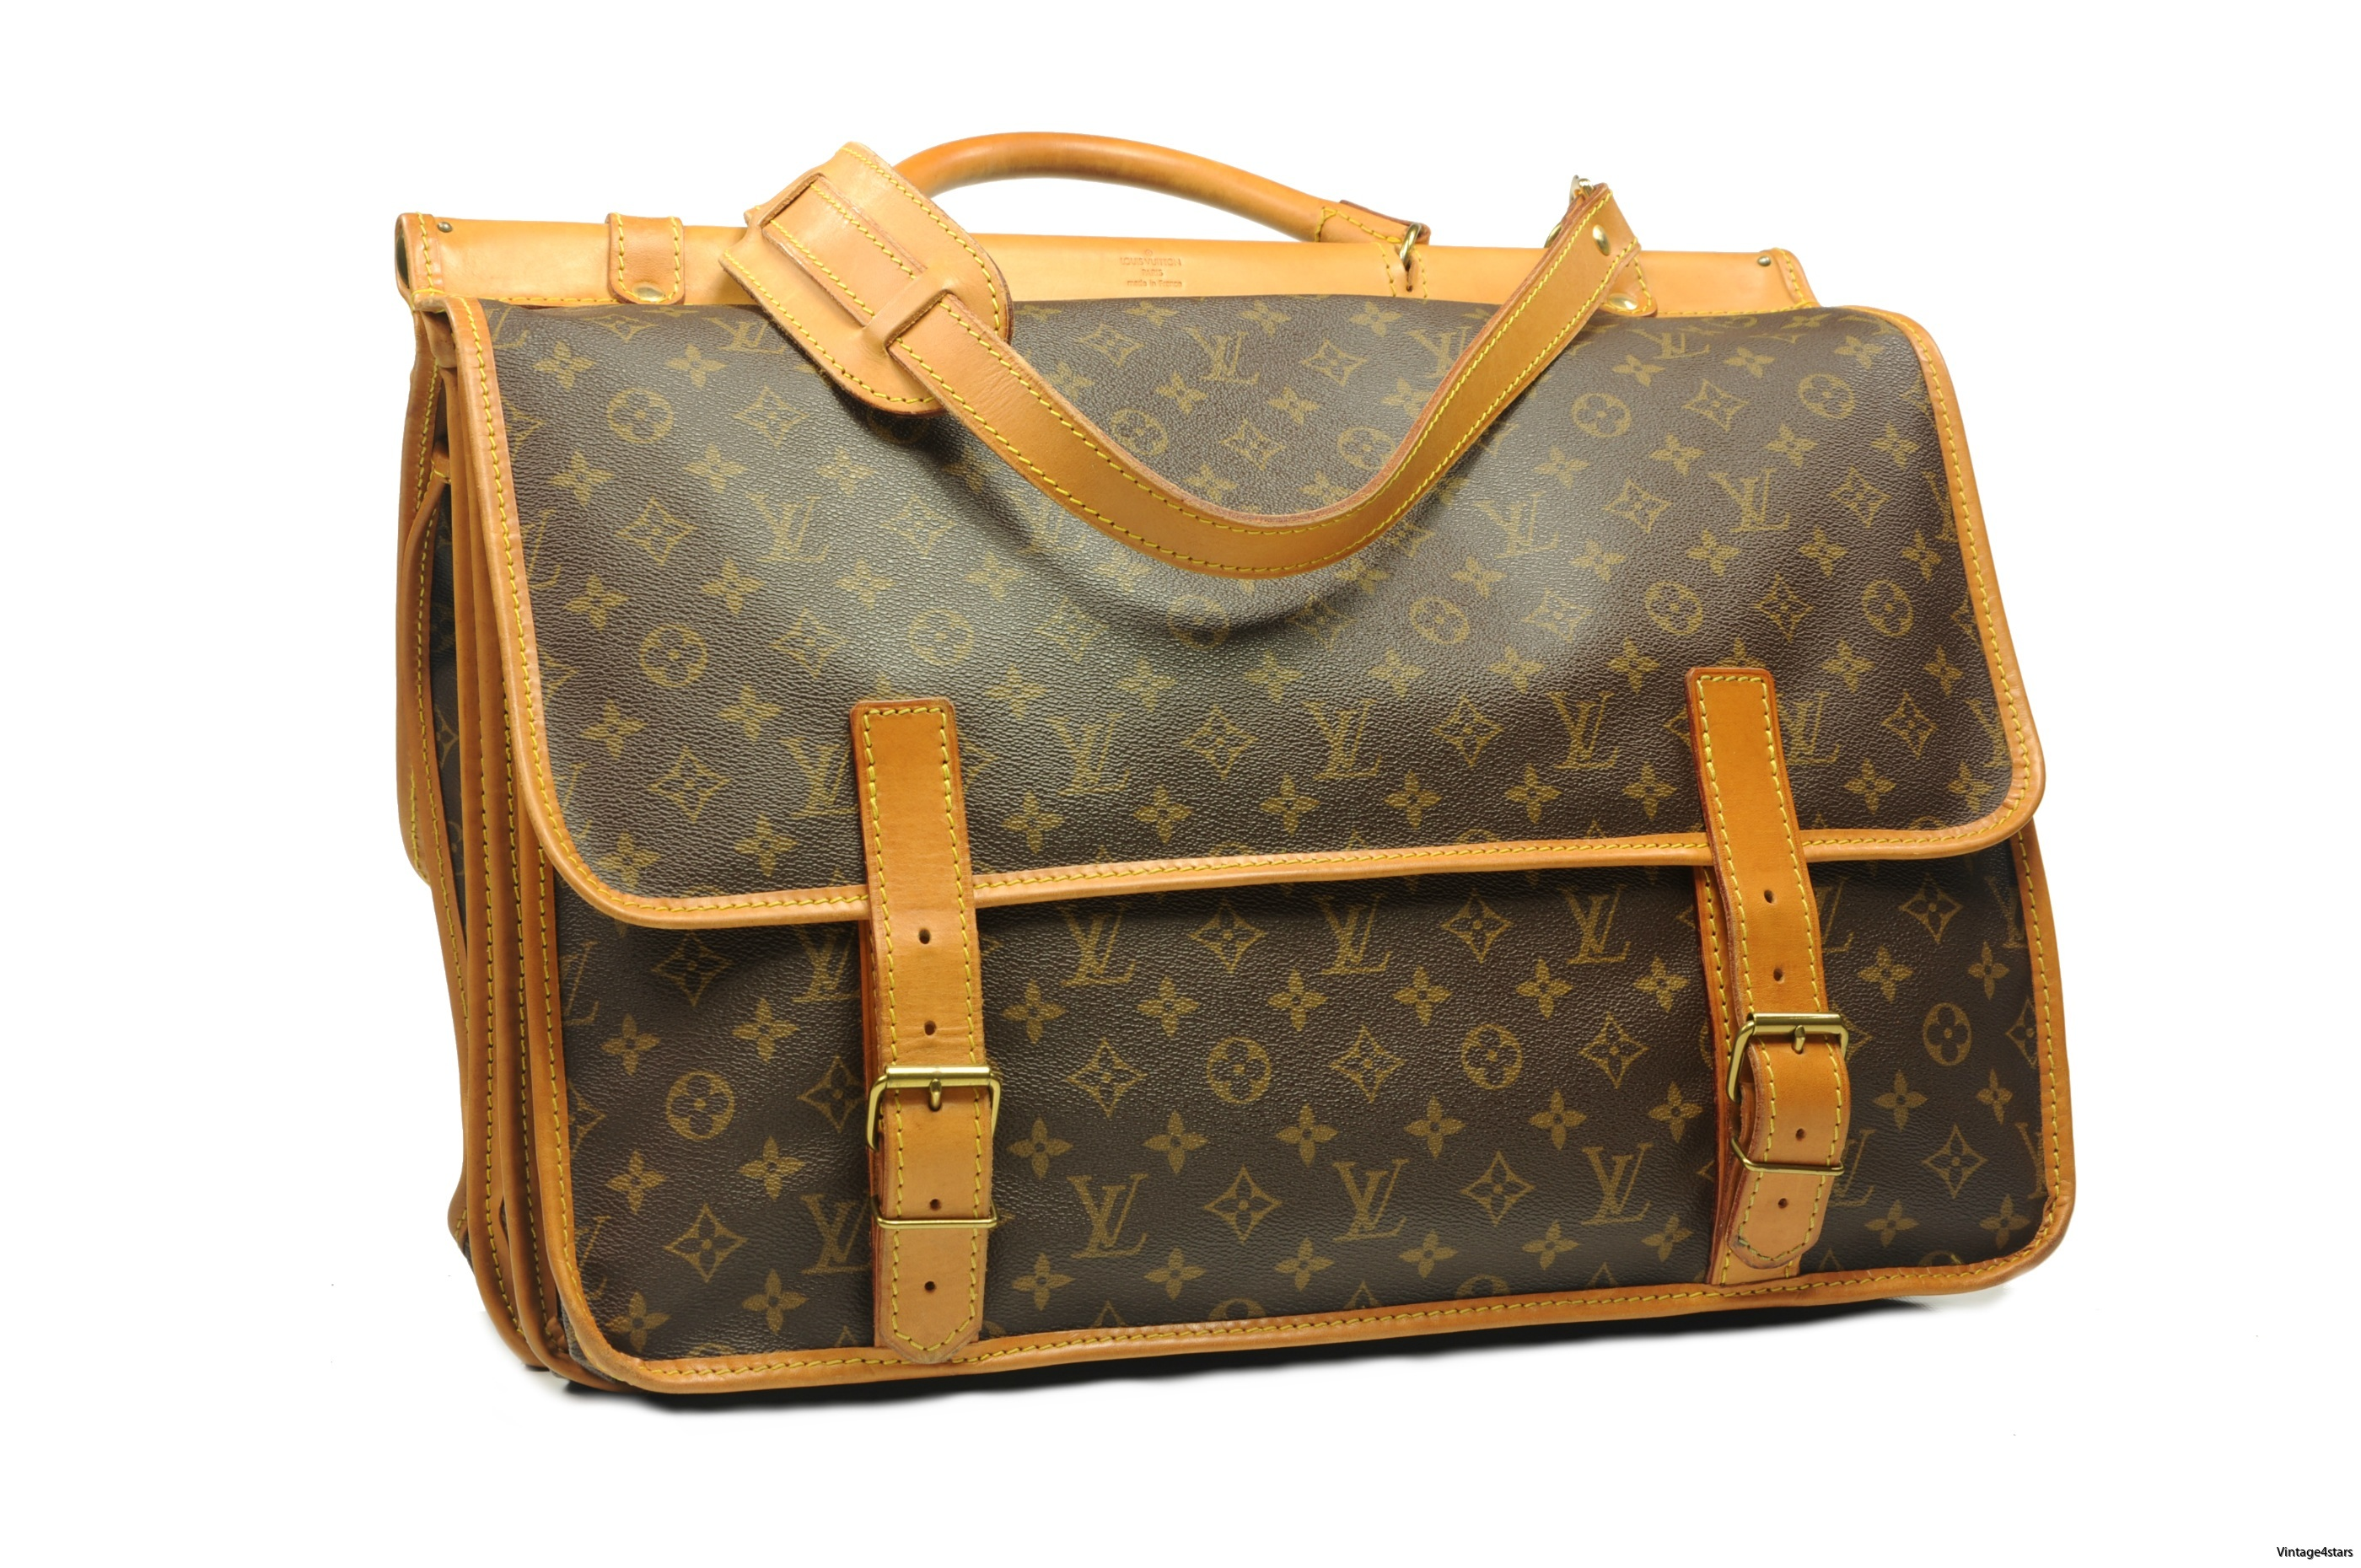 Louis Vuitton Sac Chasse Kleber 01